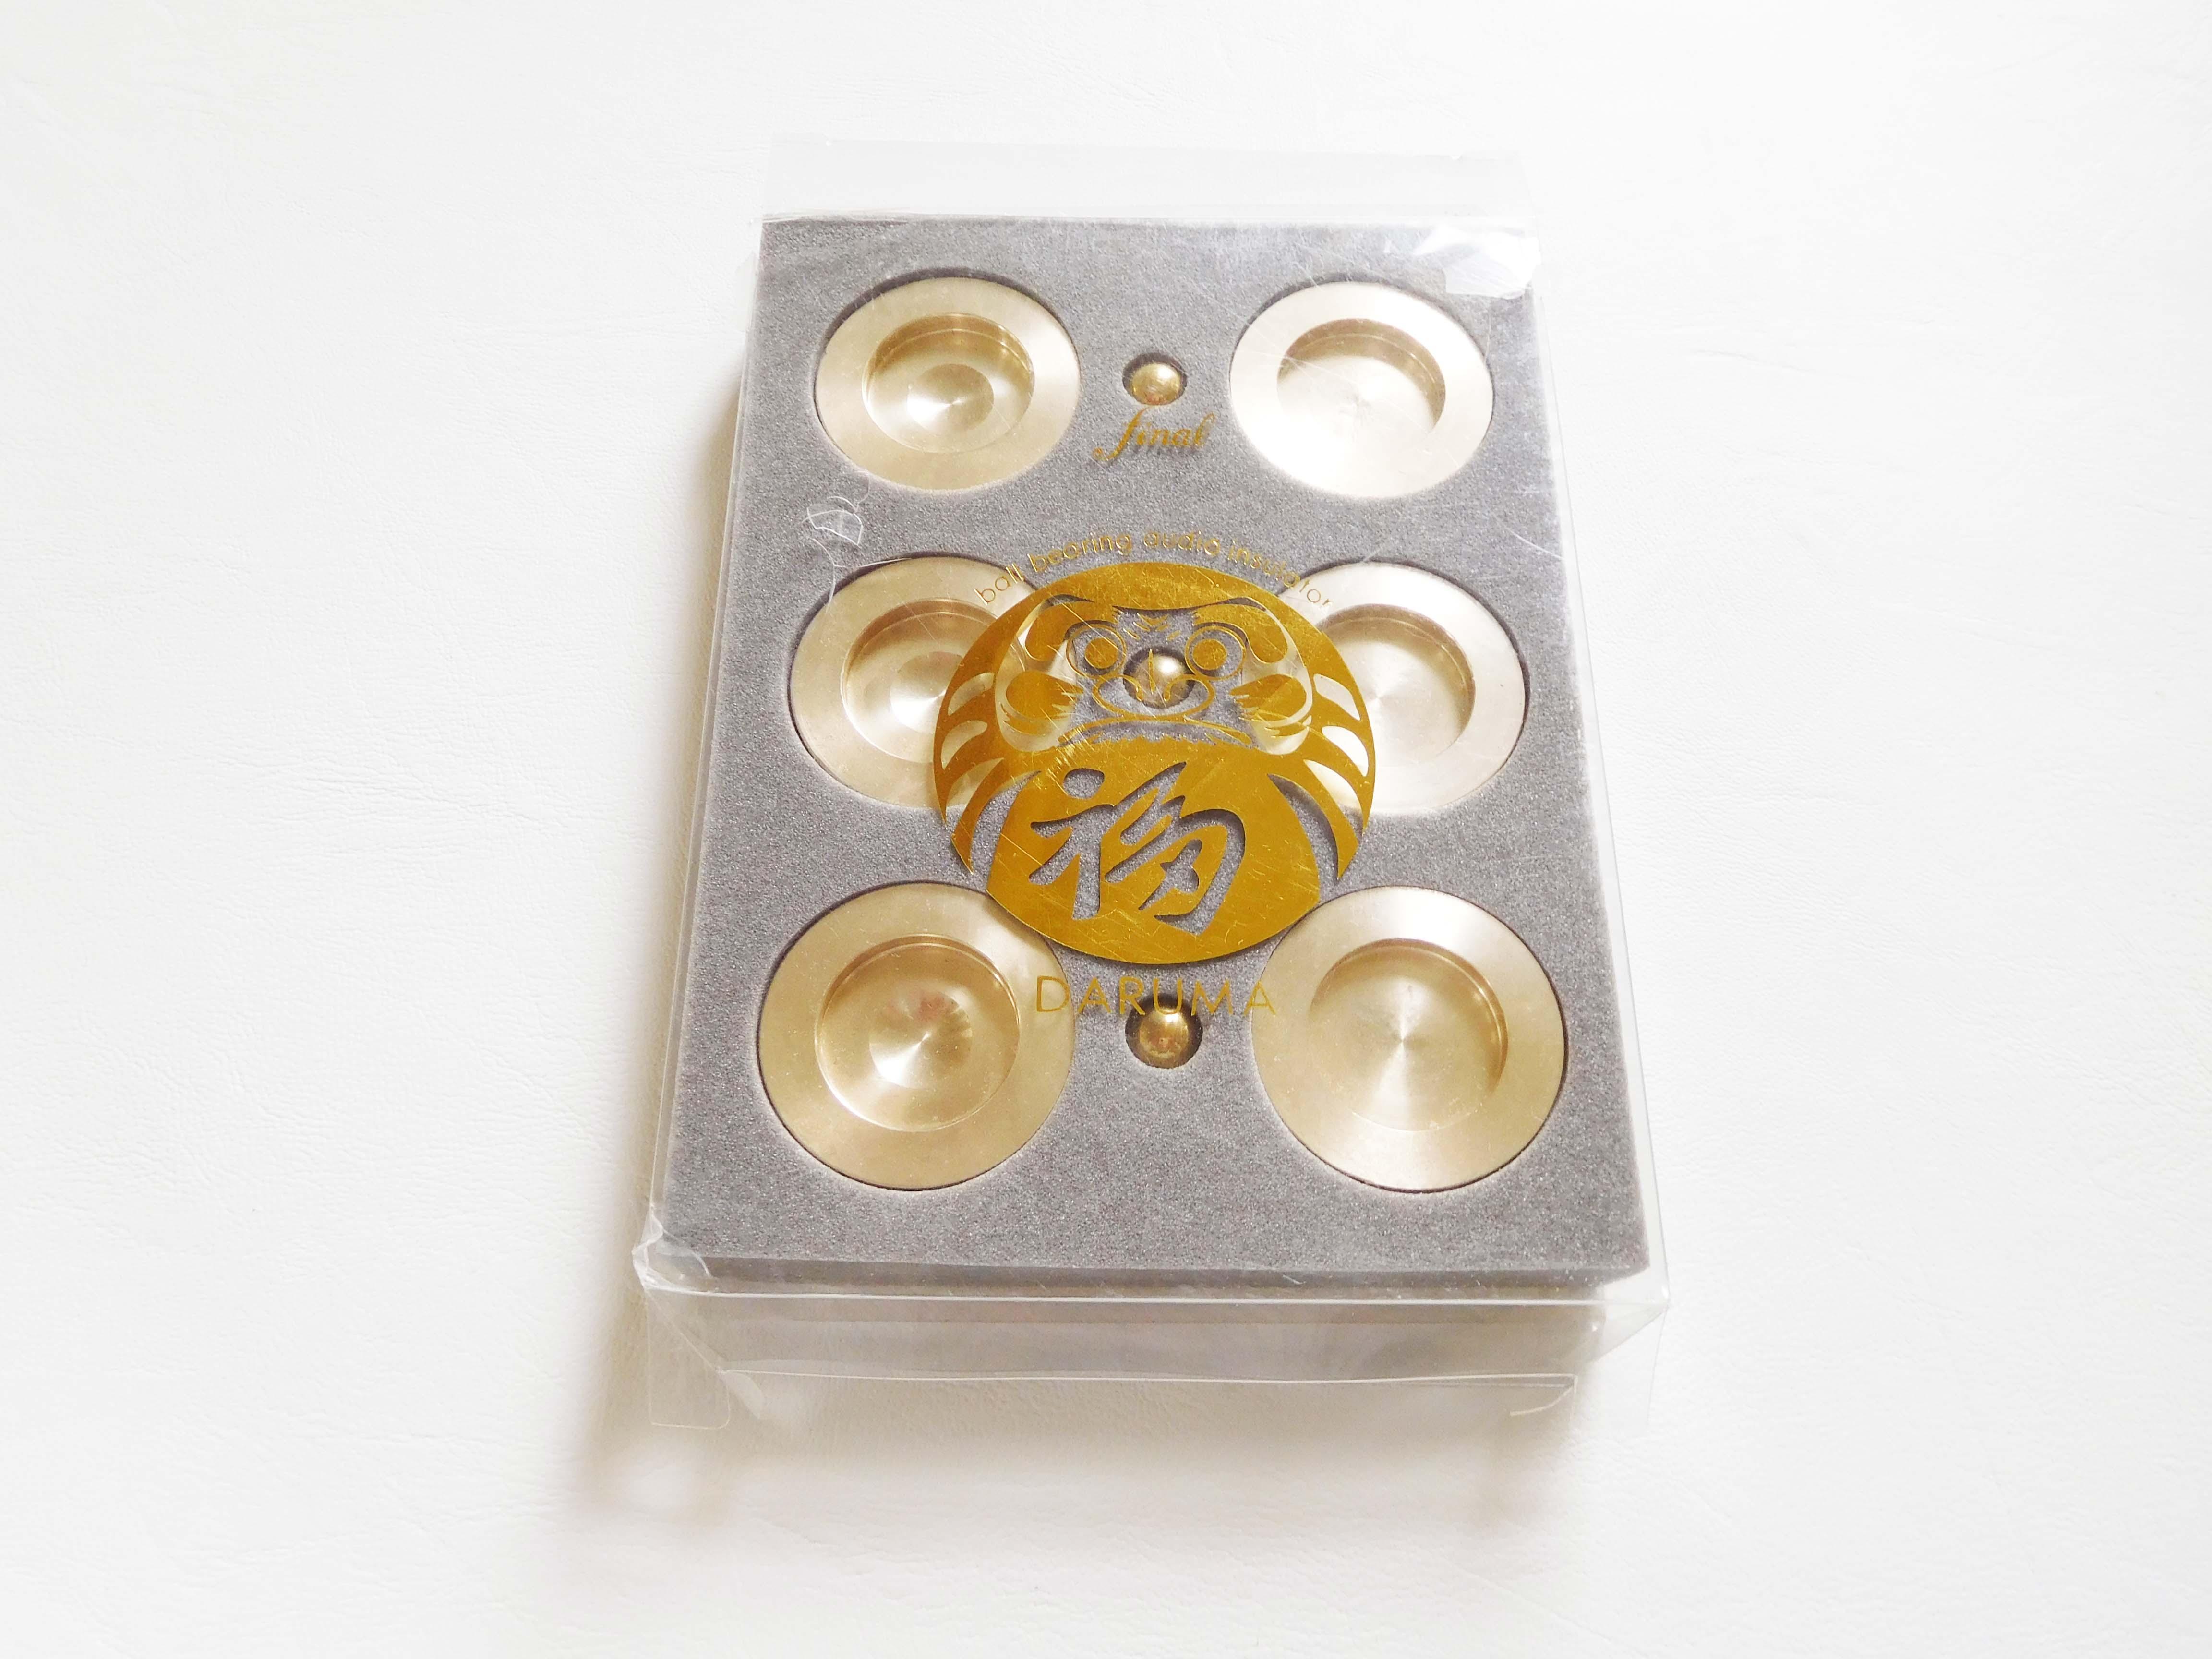 Final Labs Darum 3ii isolation bearings